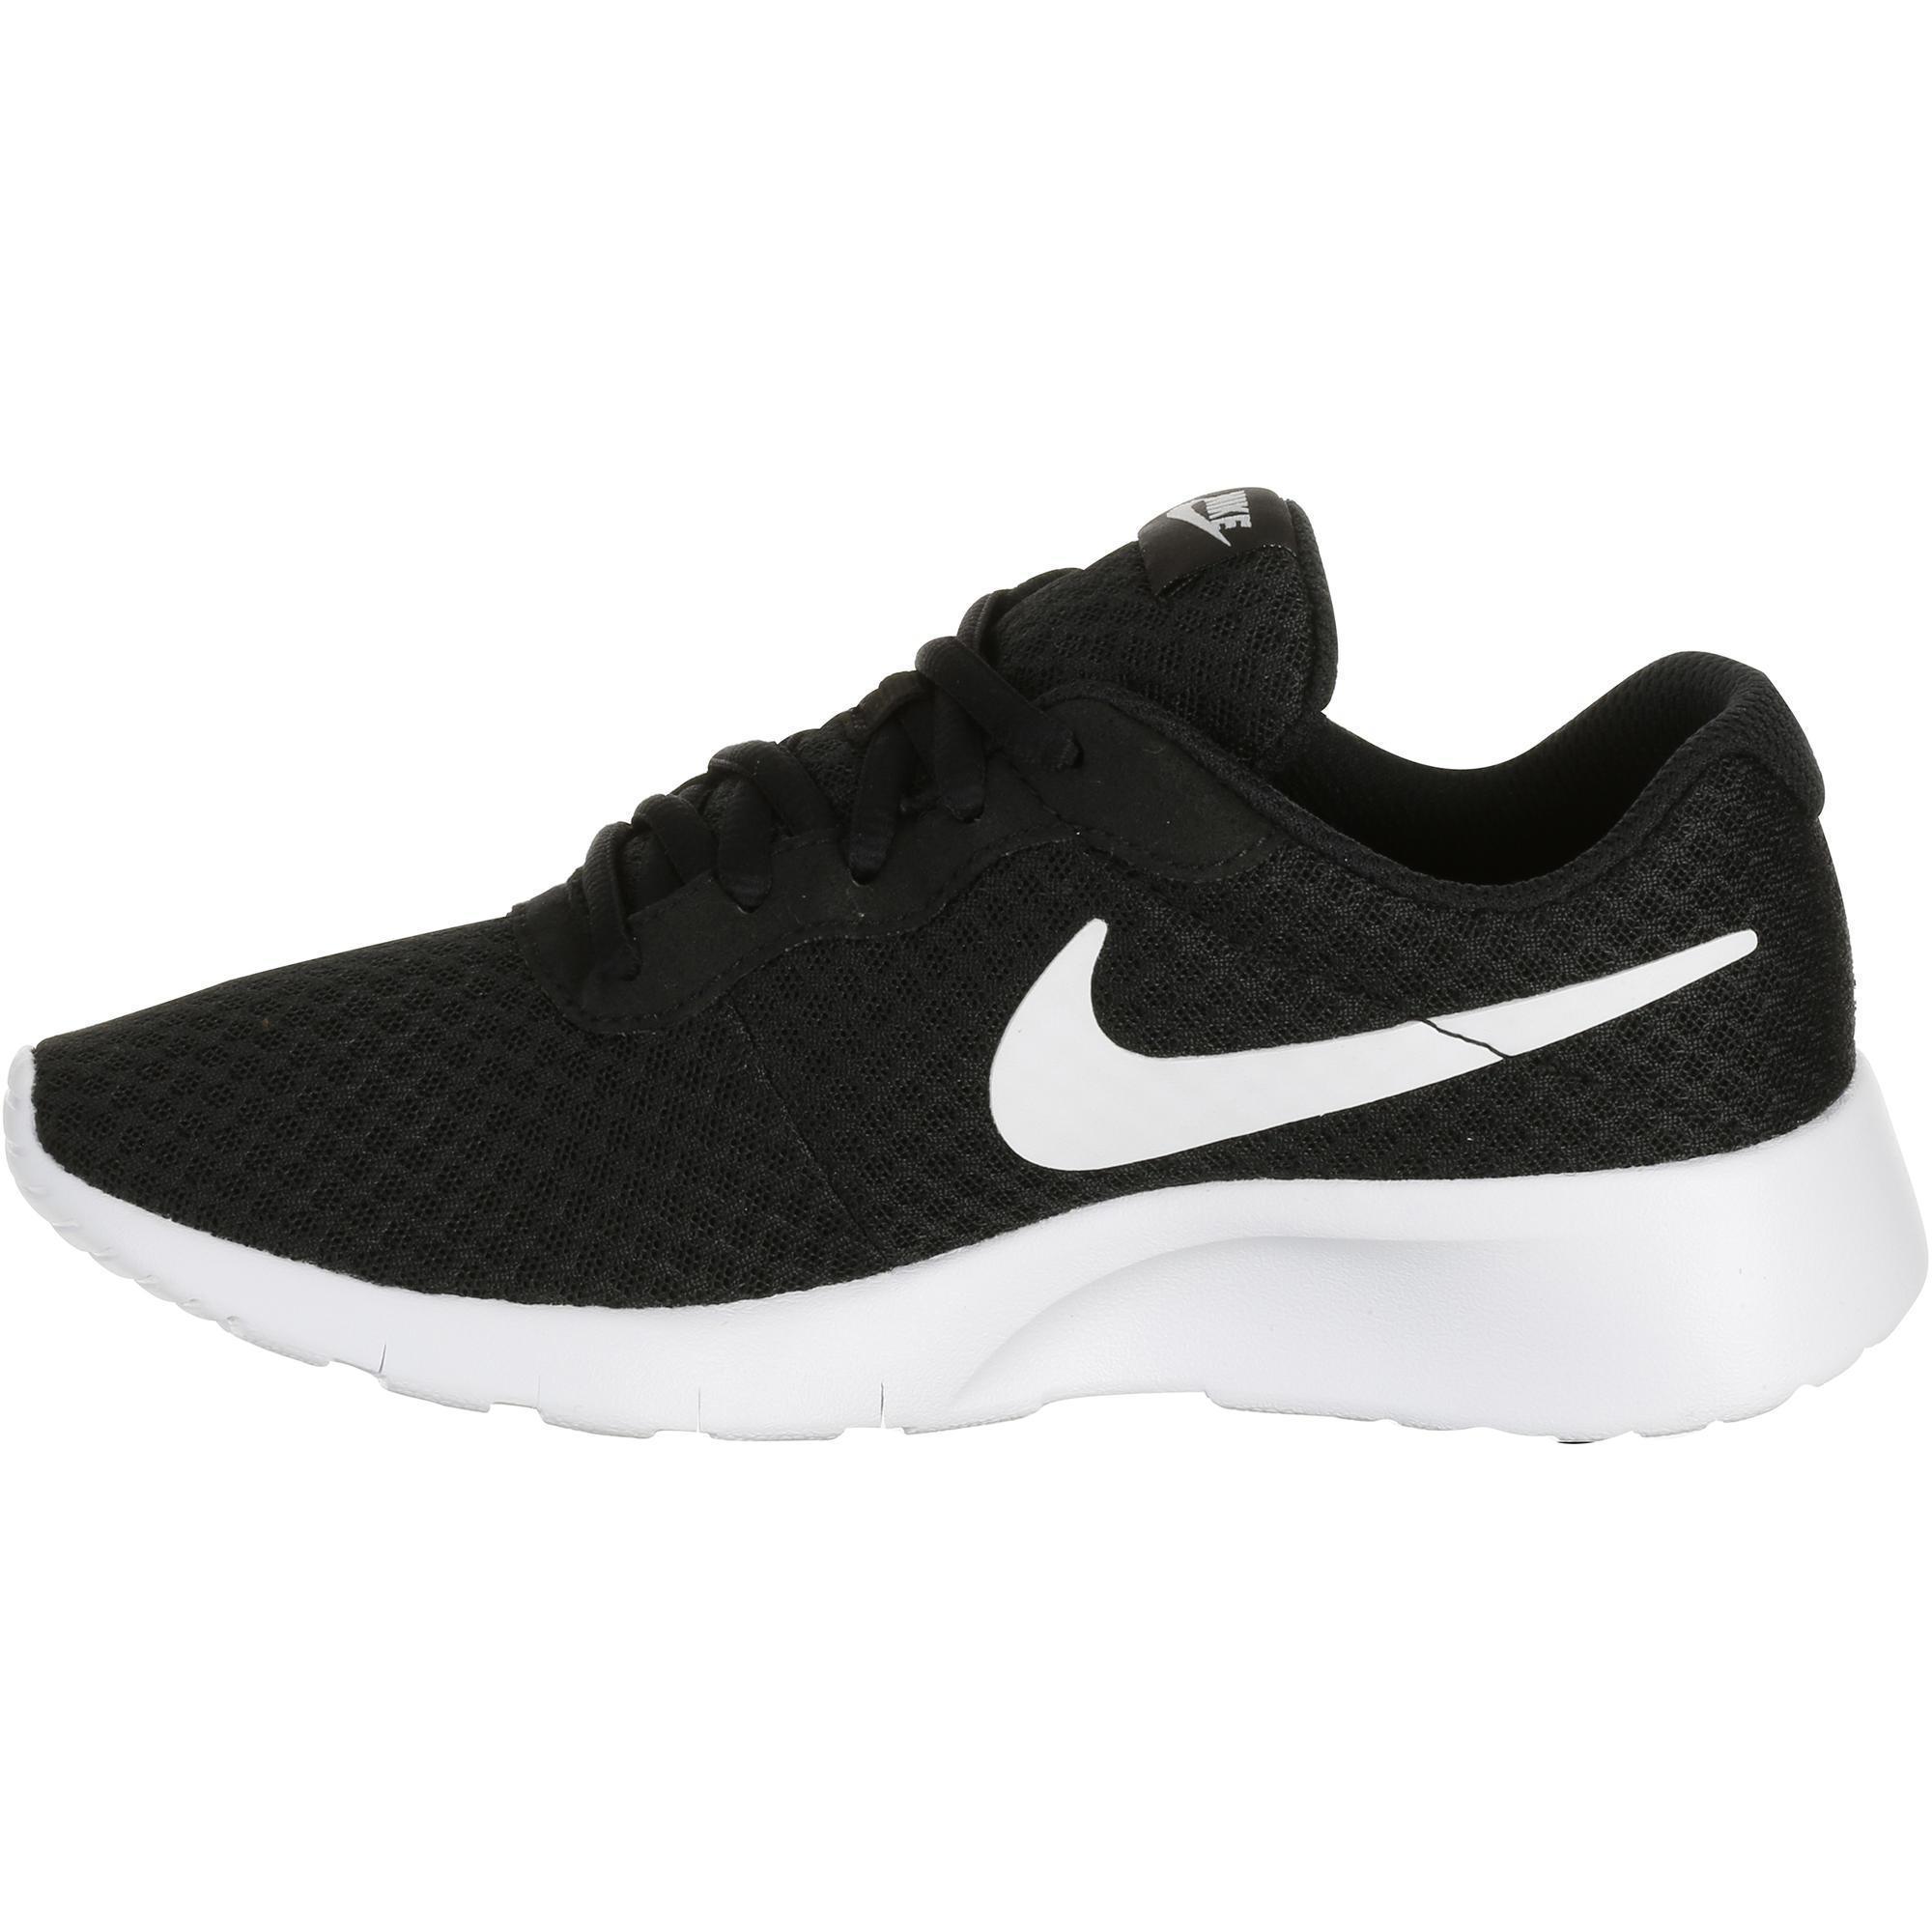 low priced 1e5c7 5a0c7 Decathlon Enfant Nike Blanc Chaussures Noir Marche Sportive Tanjun ATqAxXaw